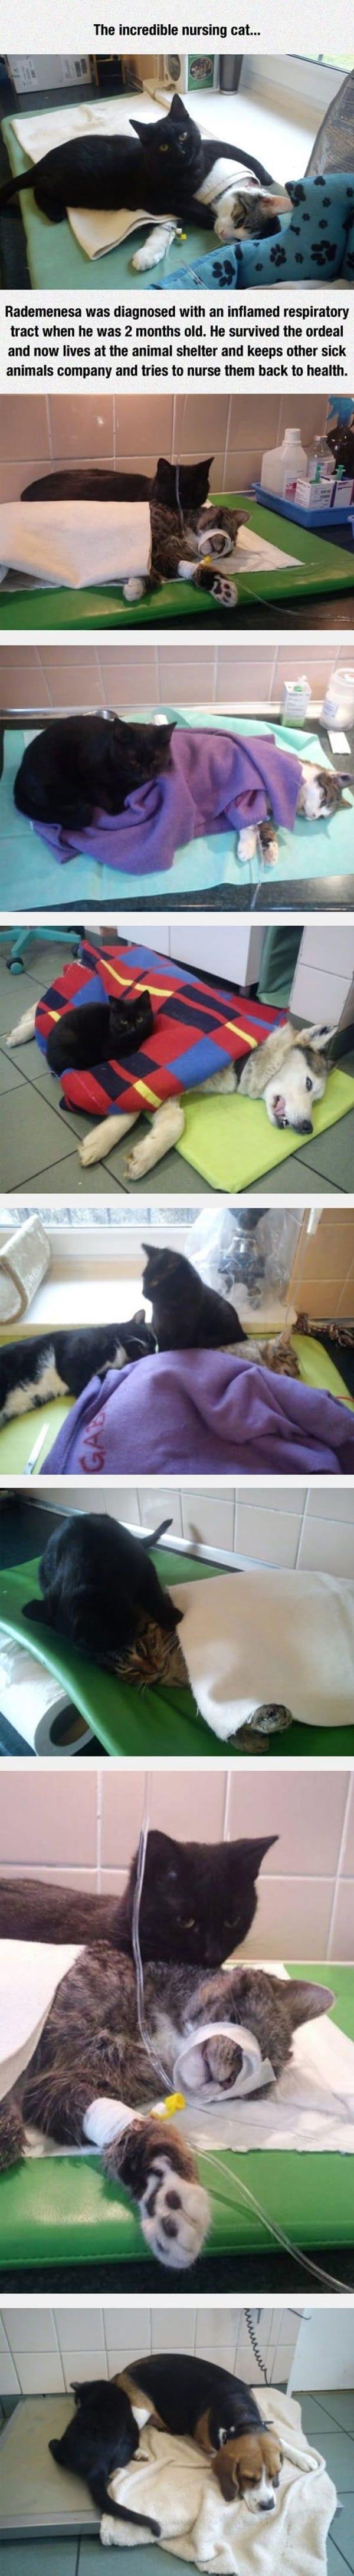 10 Heart Touching Animals Stories 6